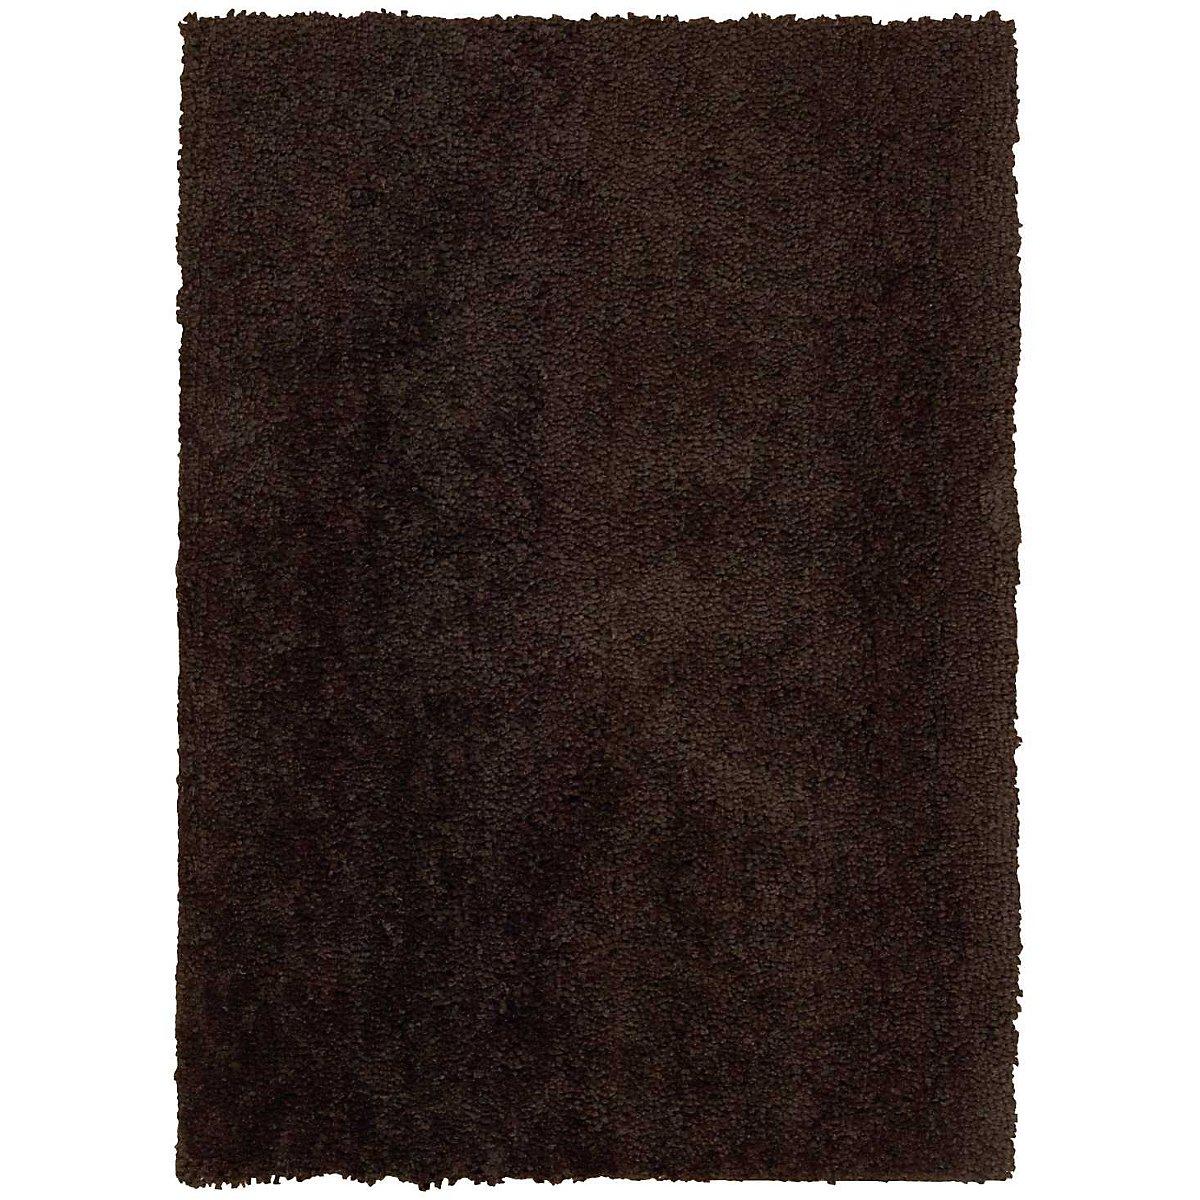 Puli Dark Brown 8X10 Area Rug